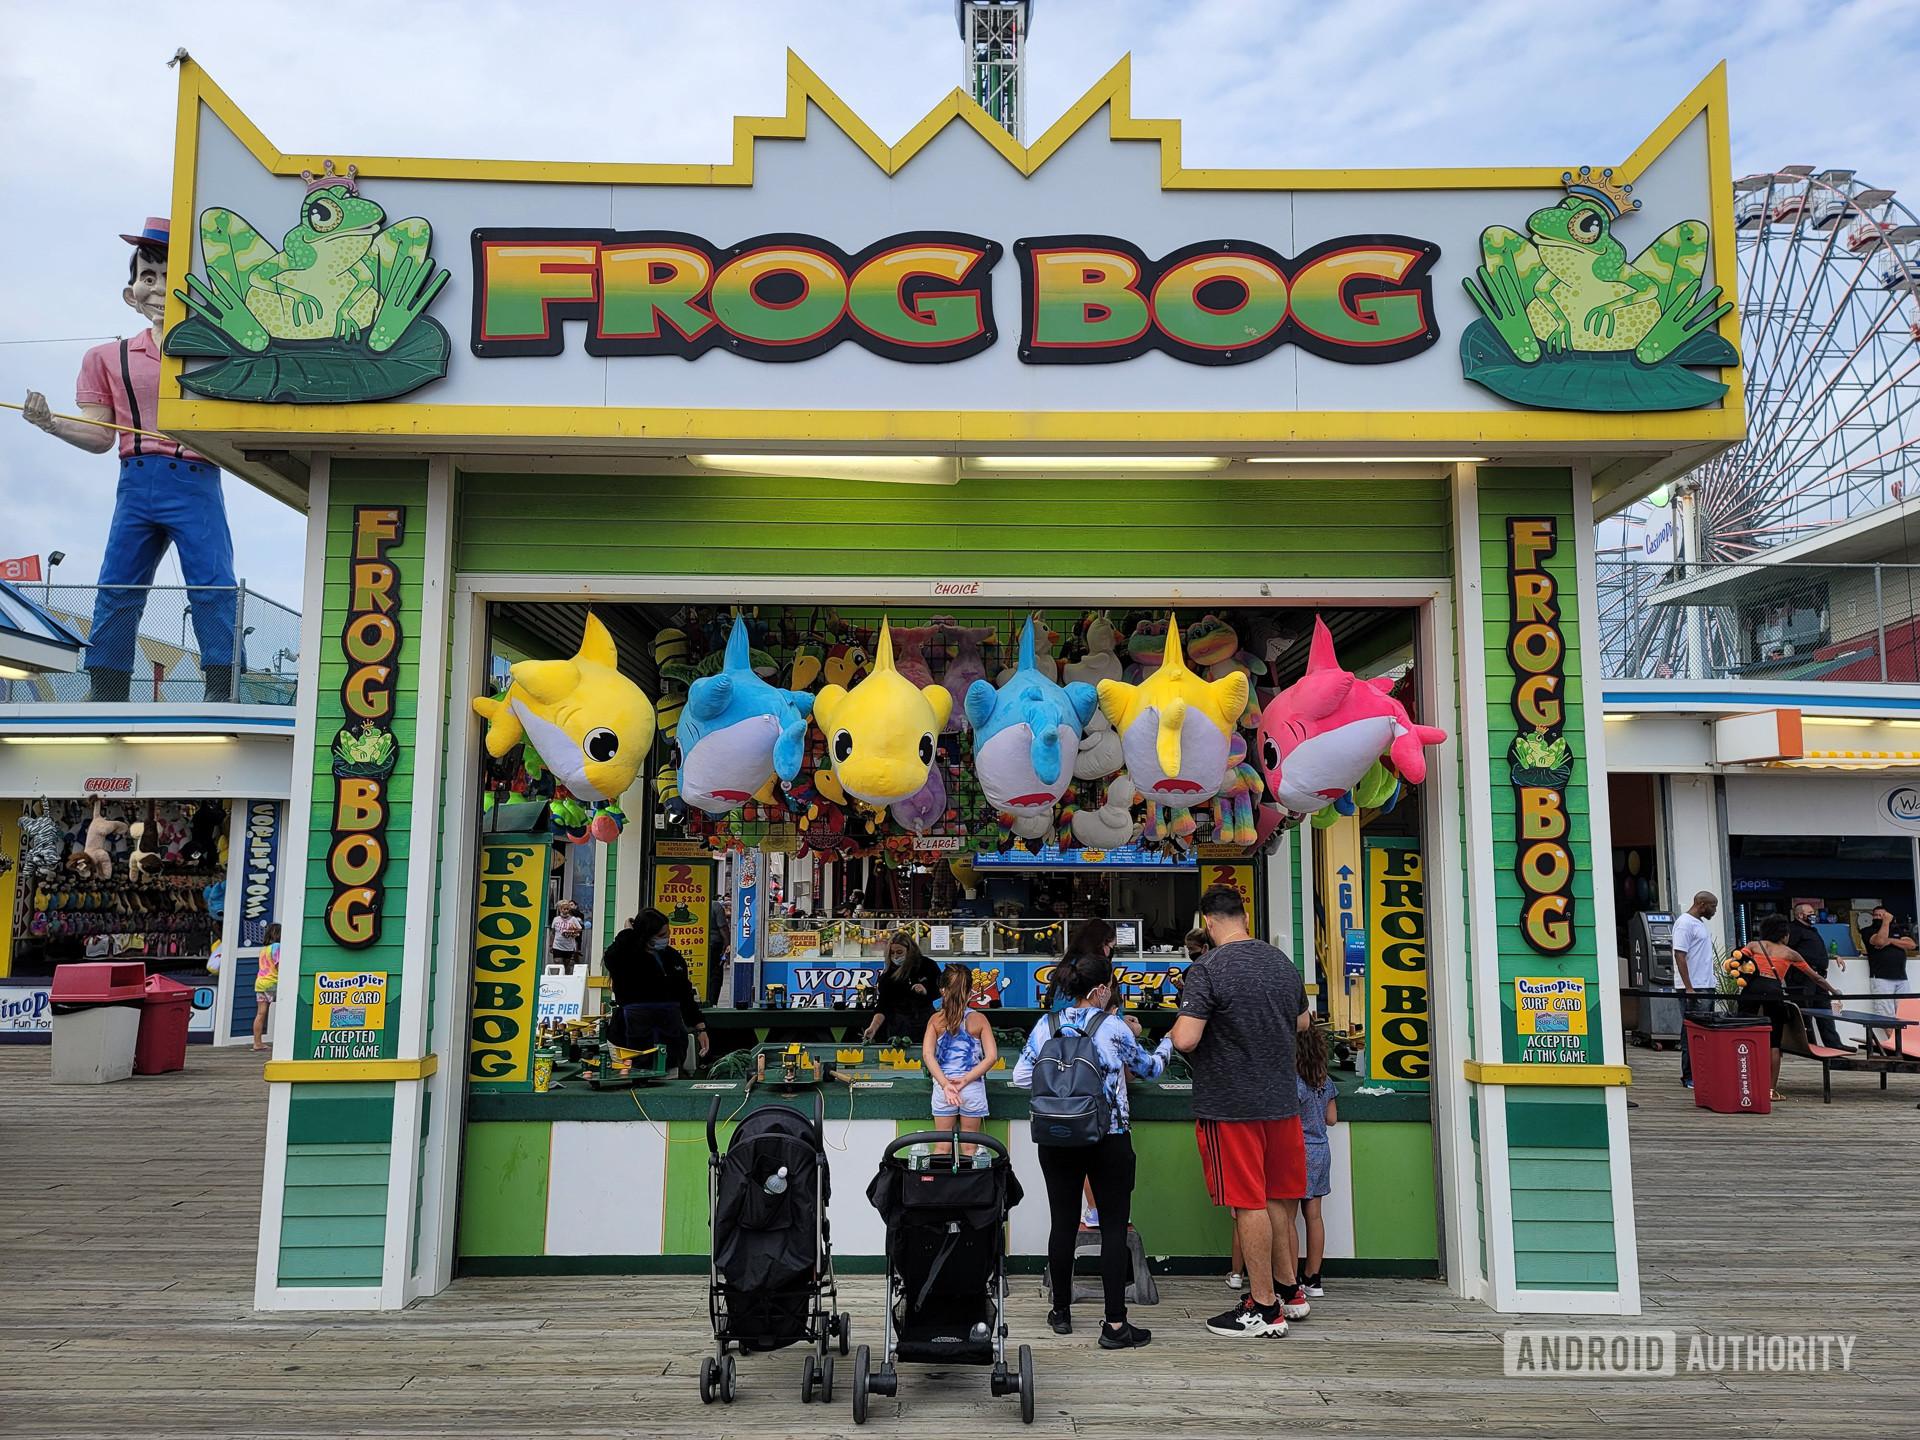 Samsung Galaxy Note 20 Ultra Photo Sample Frog BOg